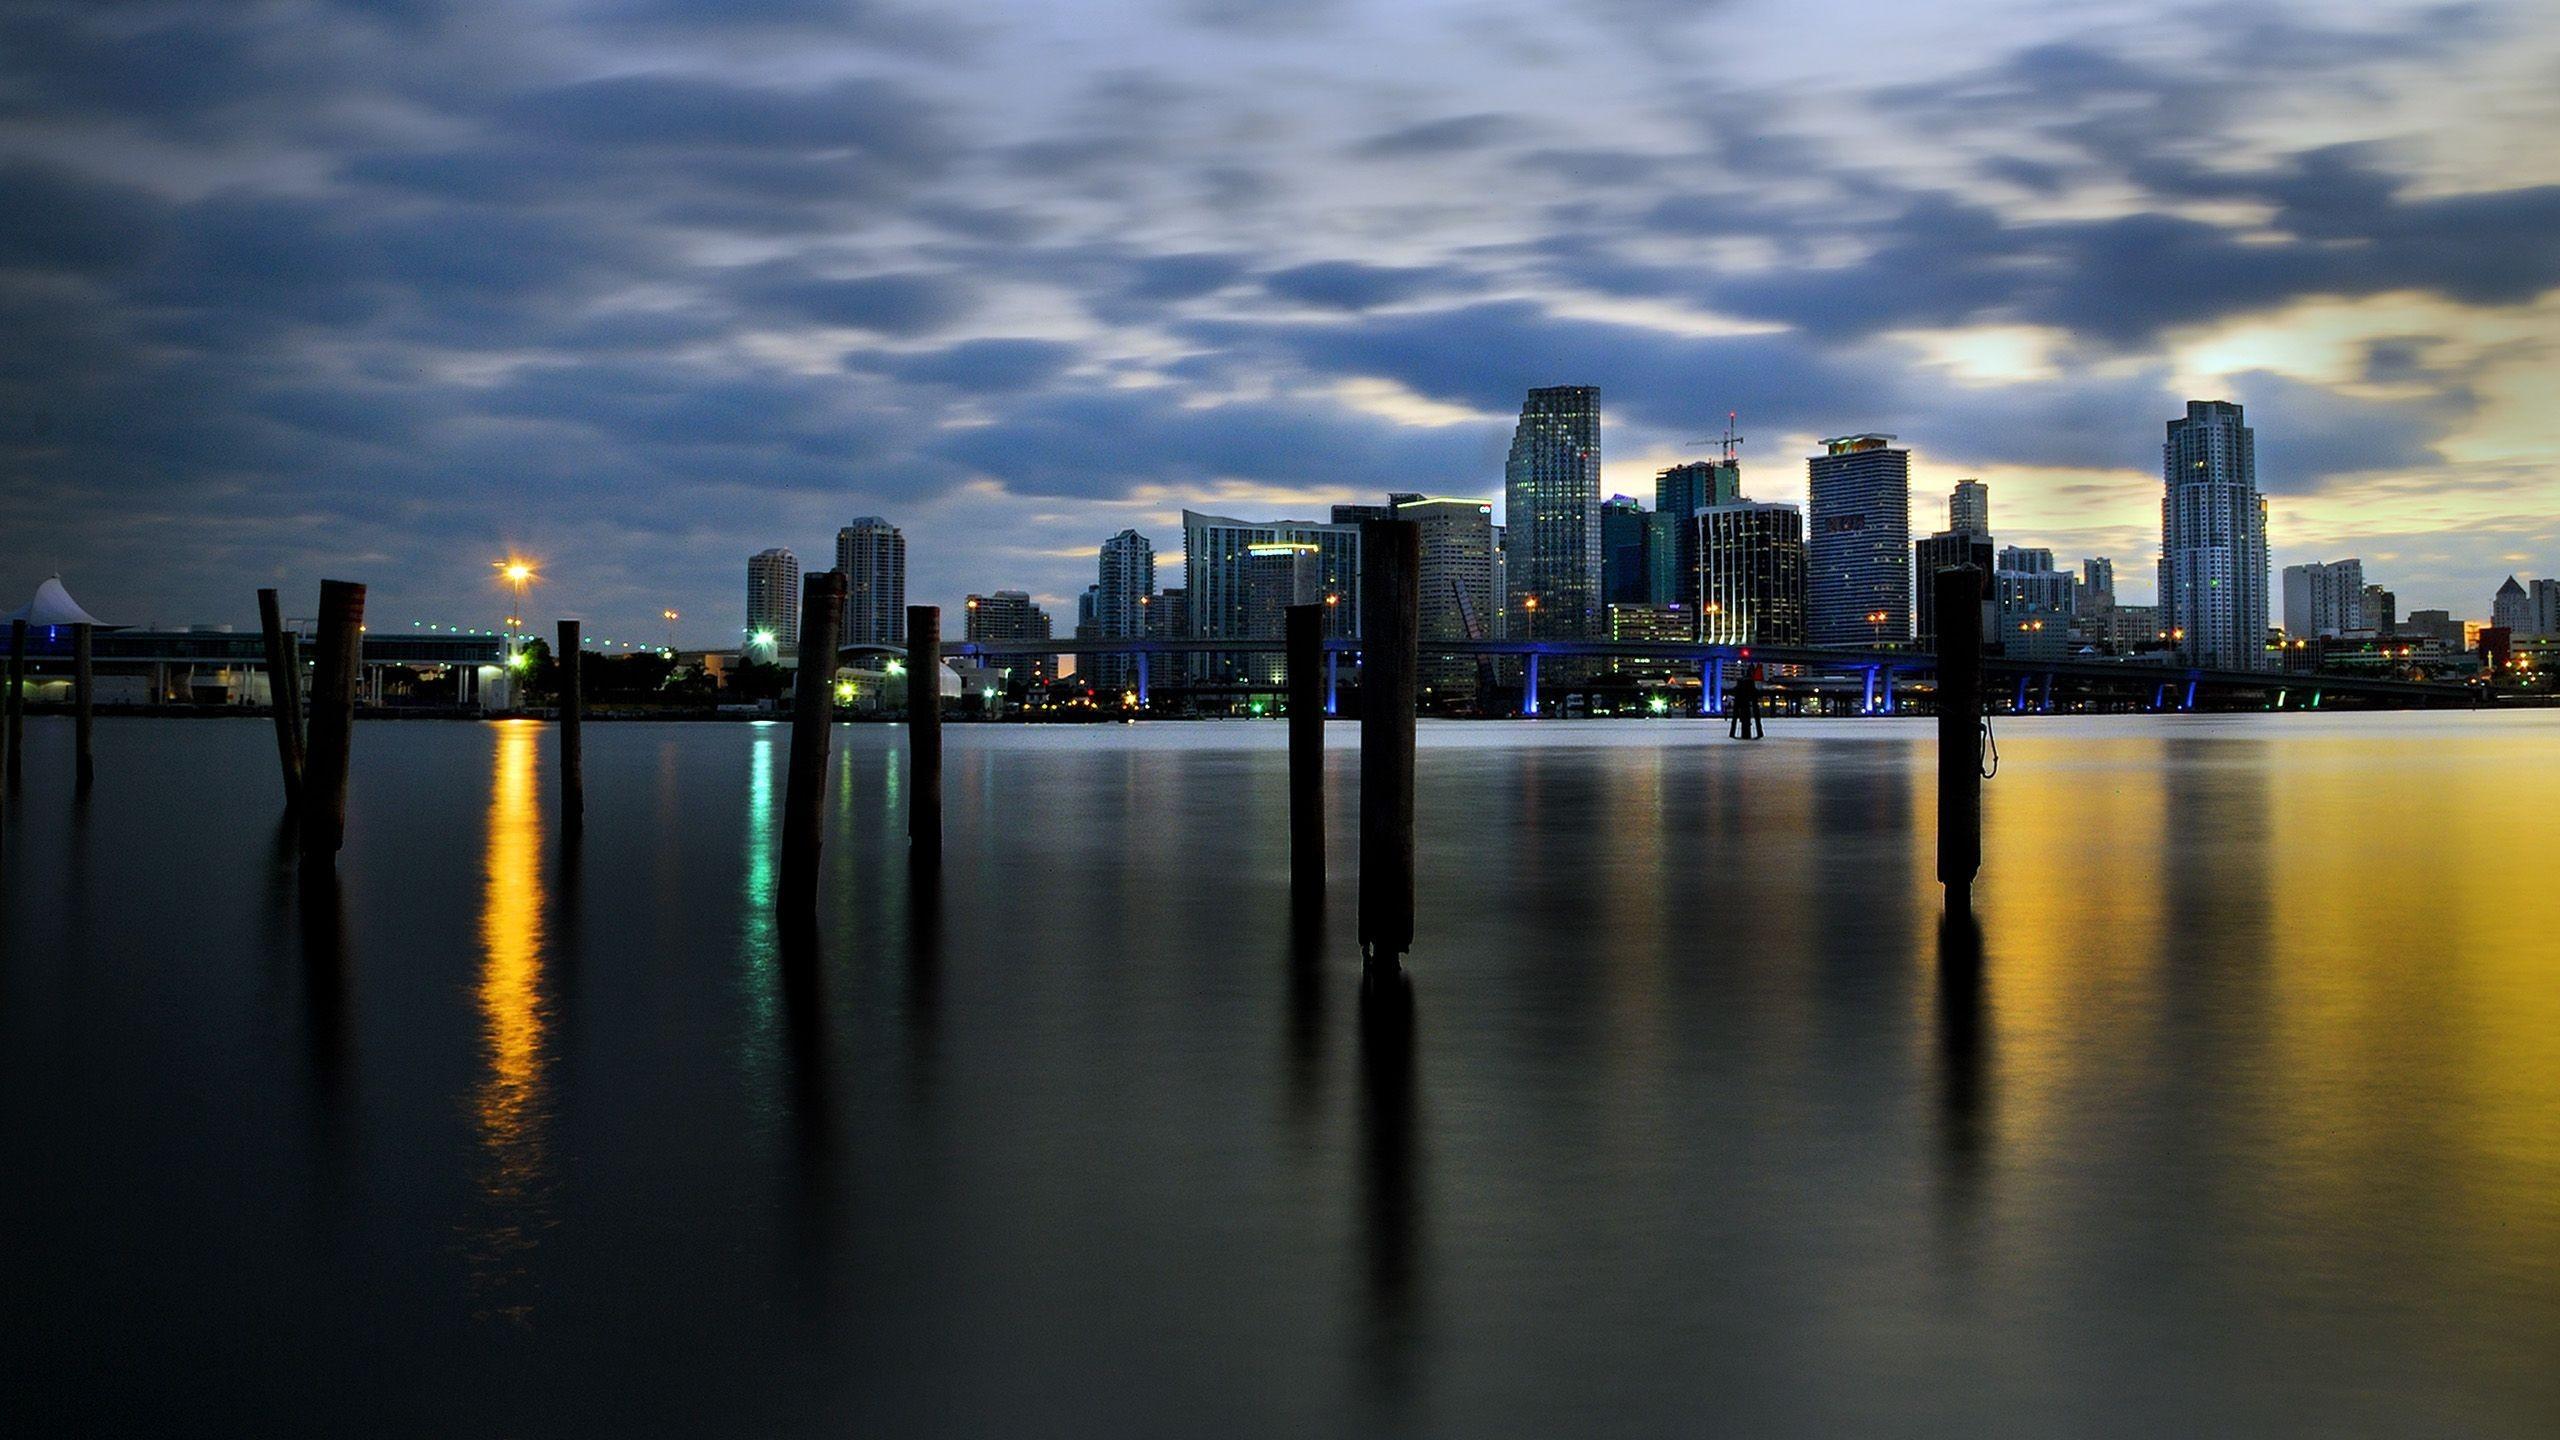 Miami City In Florida Wallpaper Cool Picture #98910x – Ehiyo.com